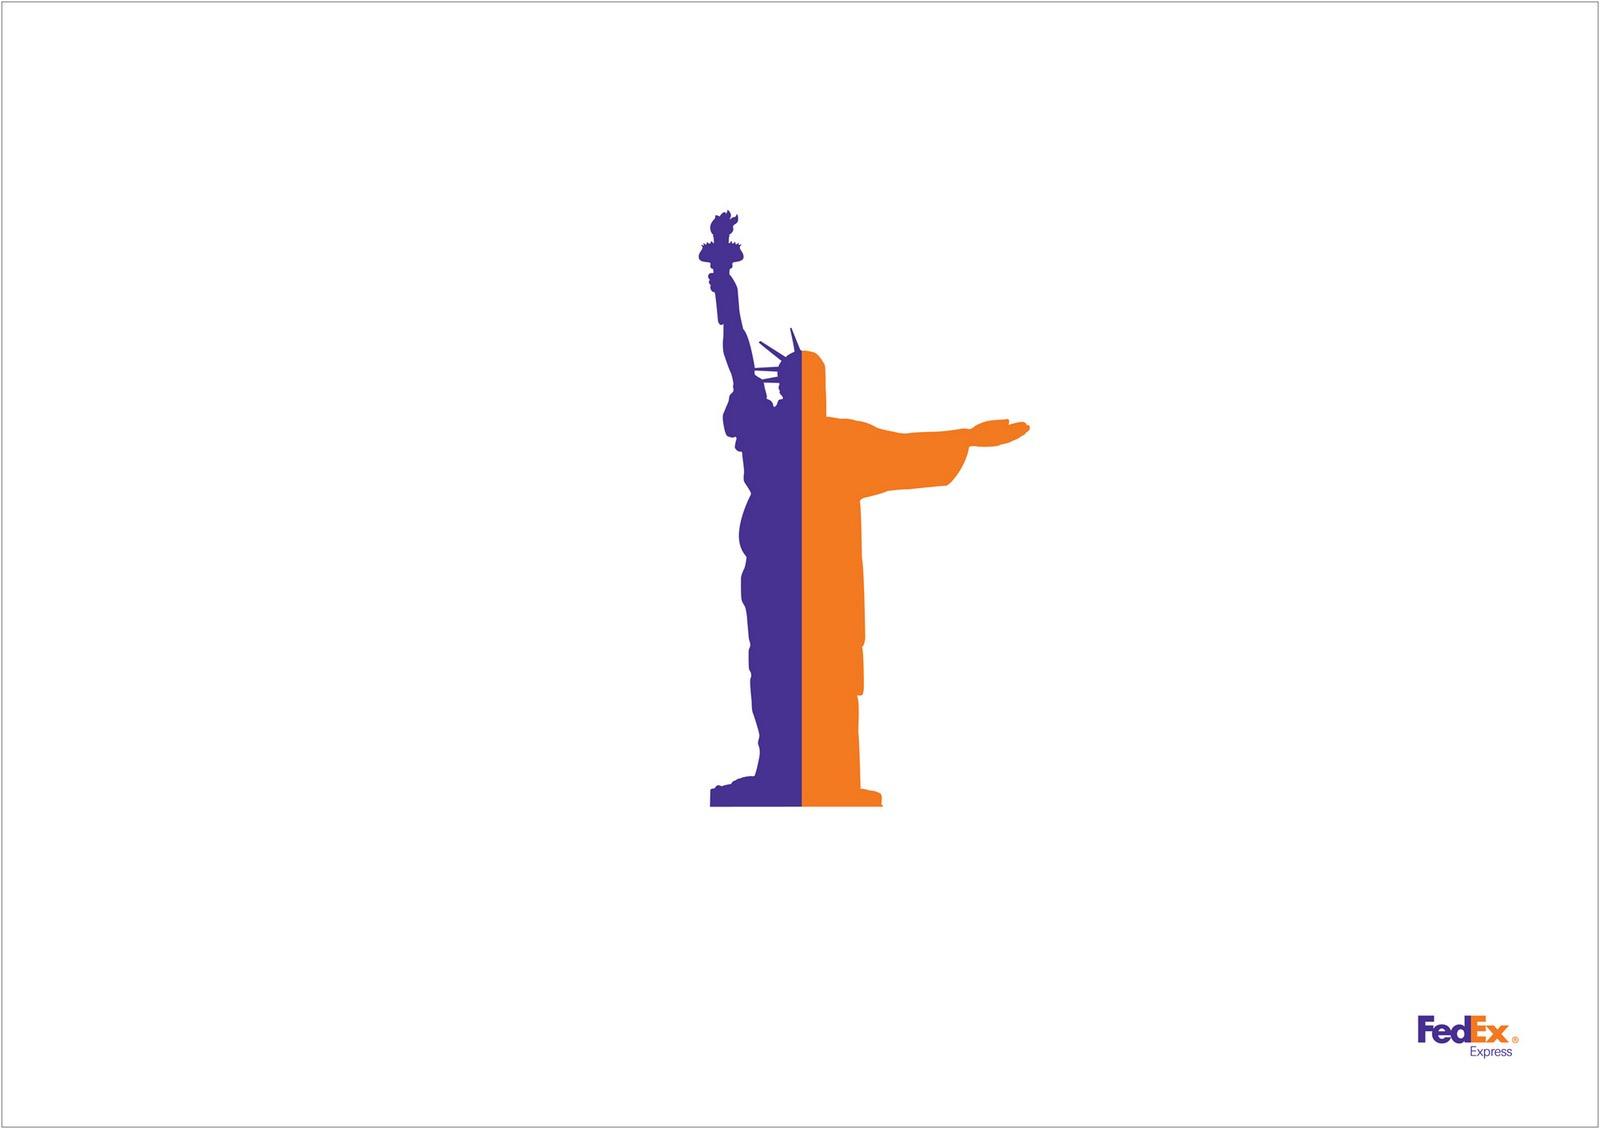 [FedEx_Statue-of-Sugarloaf.jpg]